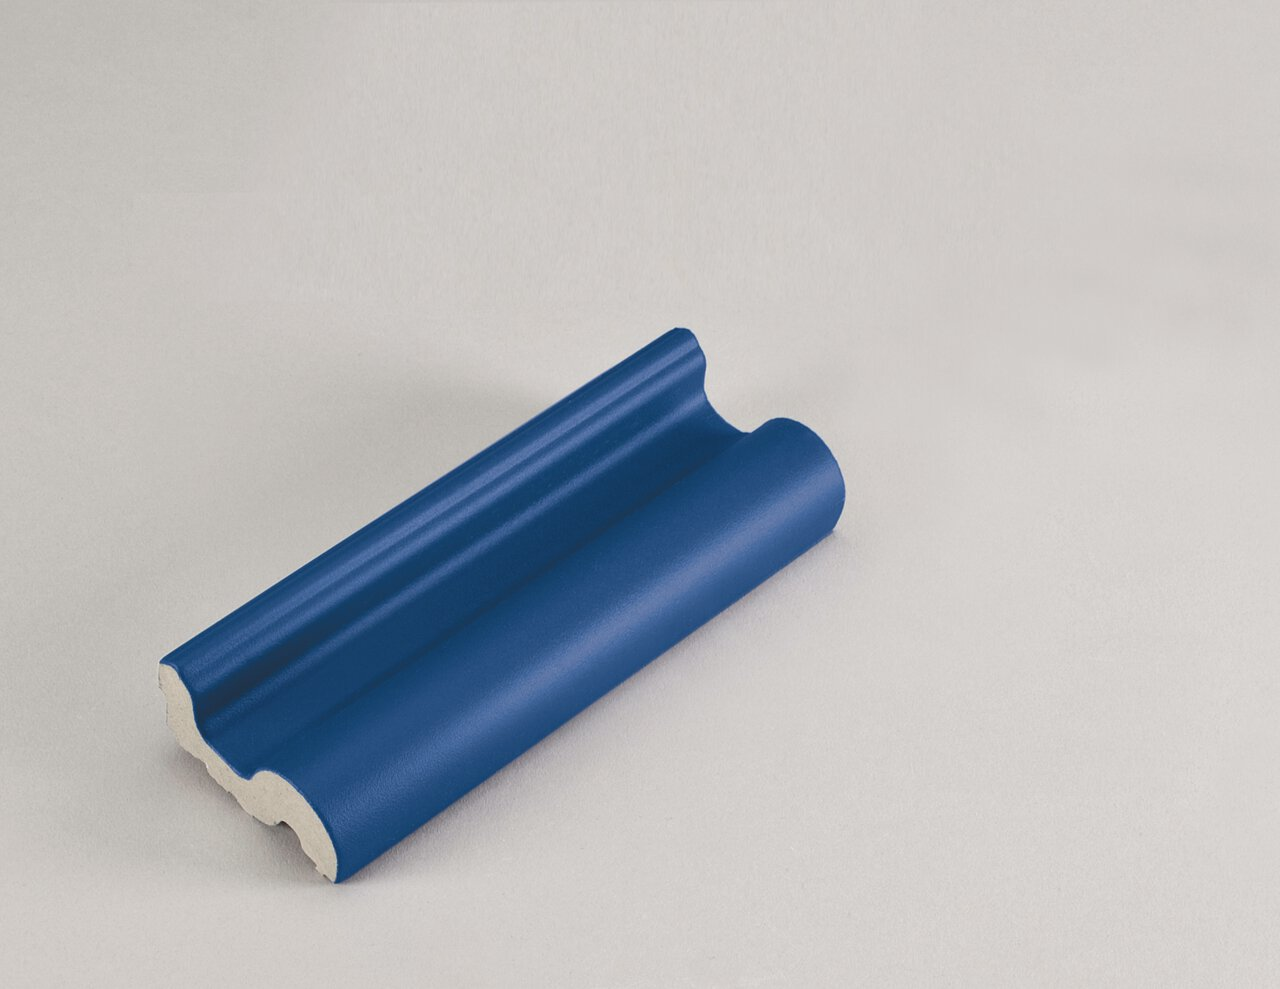 Плитка с ручным захватом 119x56x20/12.5 мм